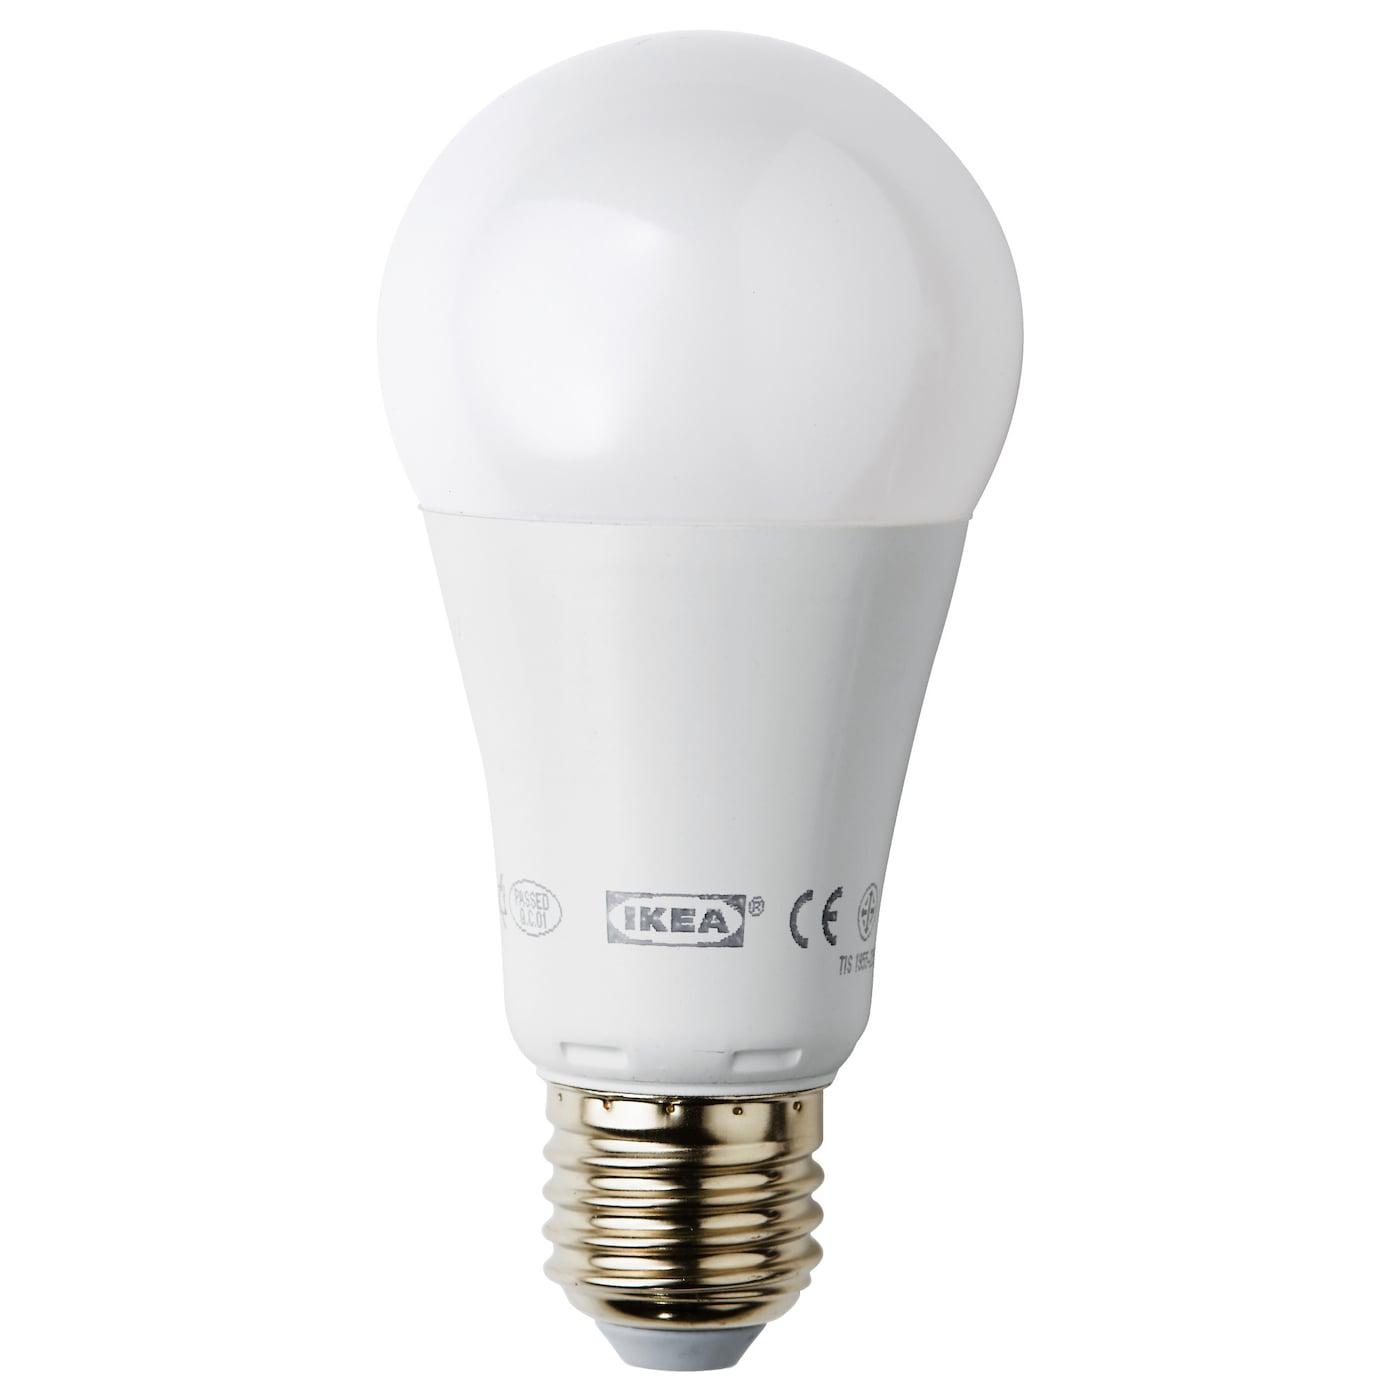 1000 images about lightbulb things on pinterest lightbulbs bulbs - Ikea Ledare Led Bulb E27 1000 Lumen